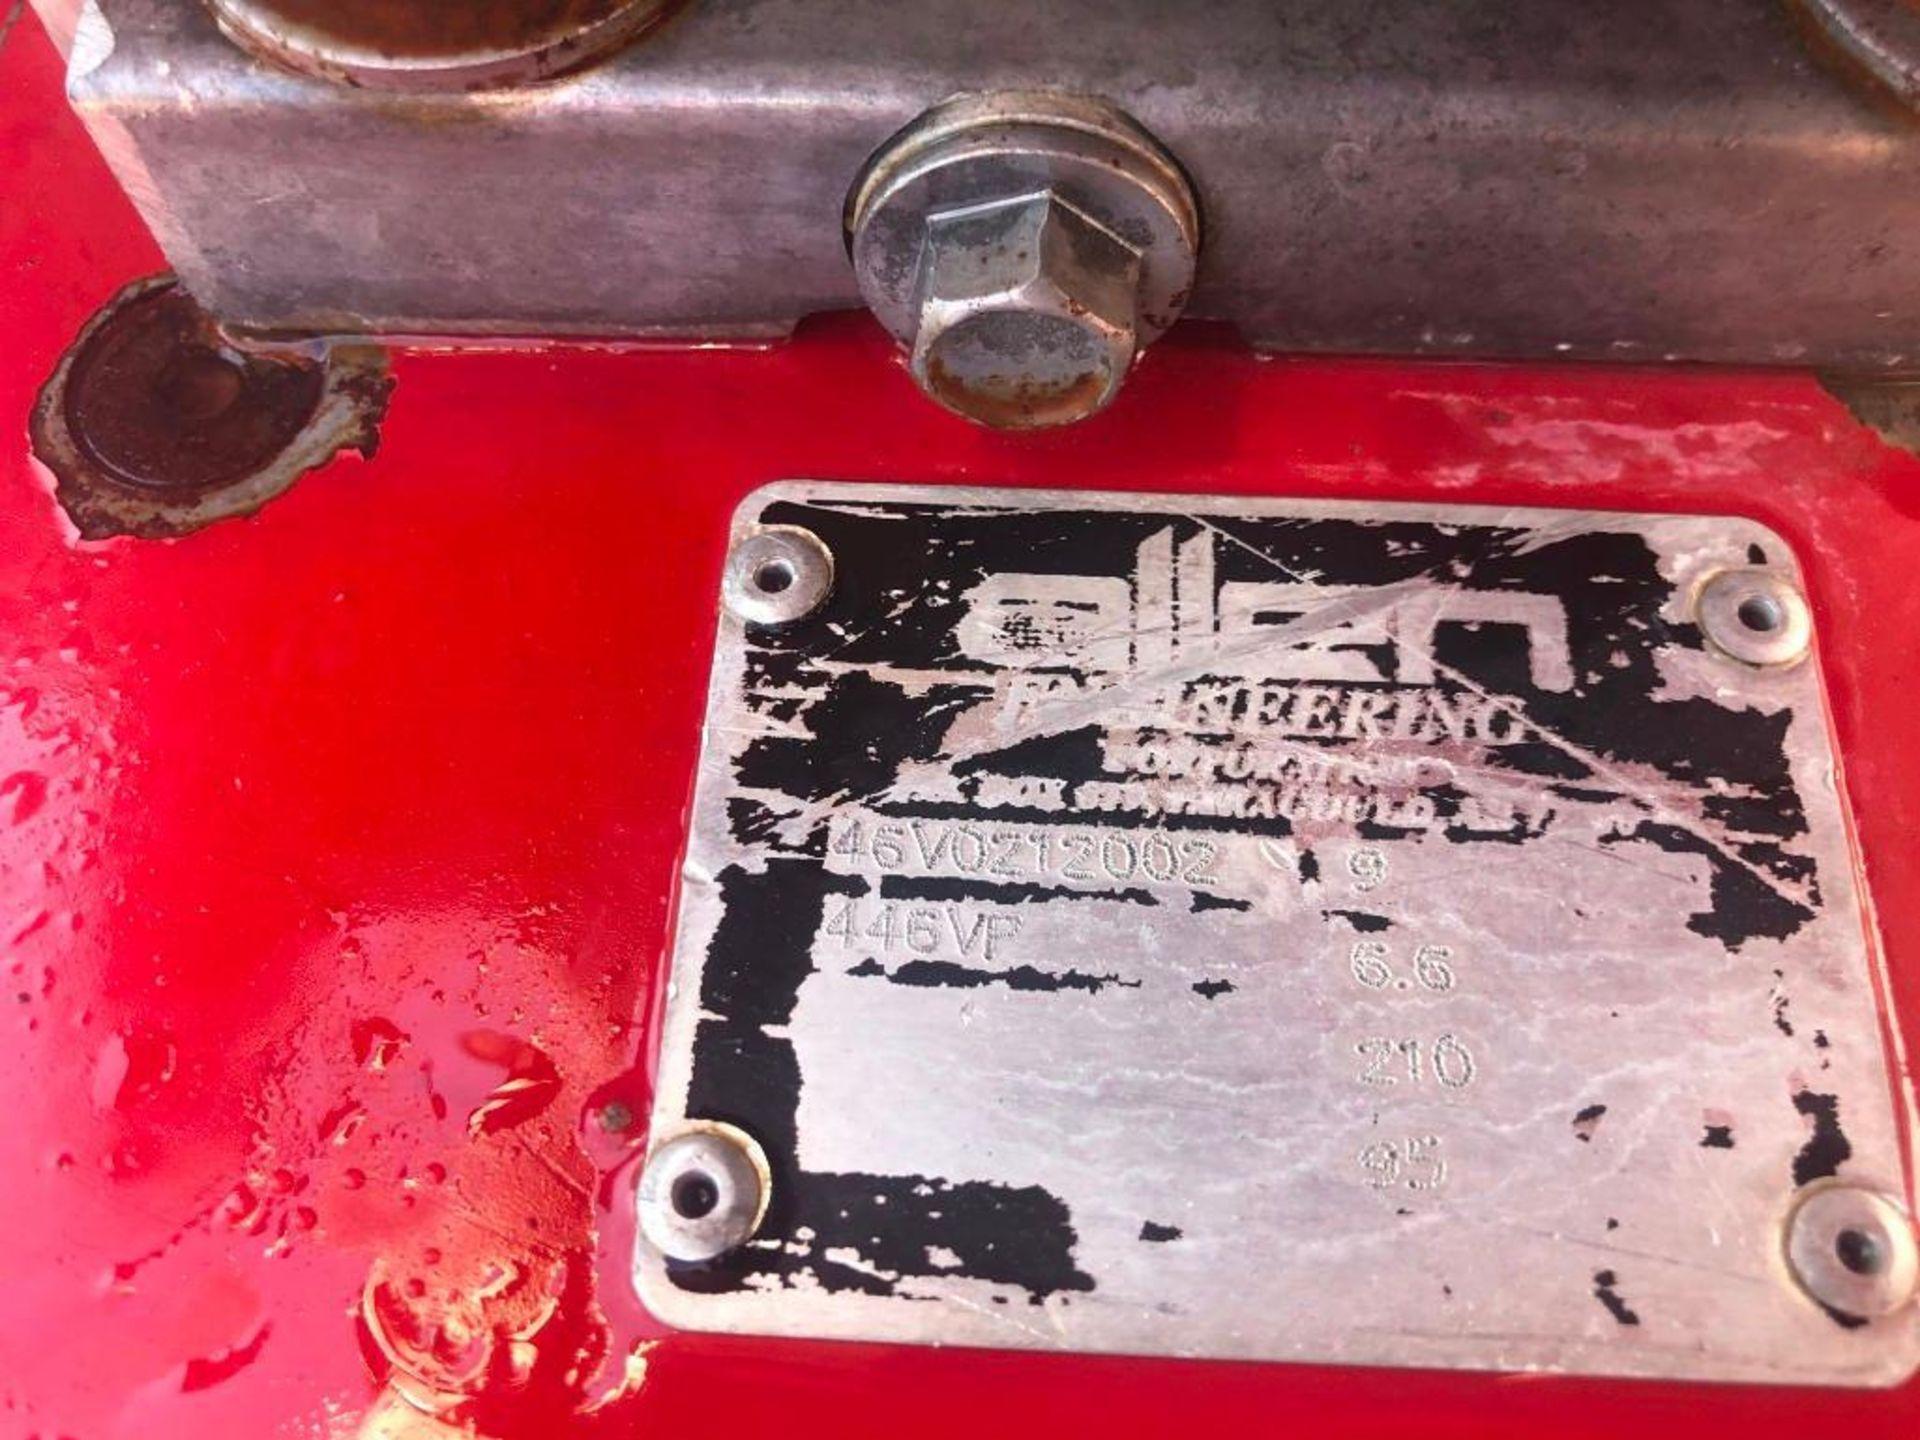 "Lot 107 - 46"" Allen Engineering Power Trowel, Serial #46V0212002, Model 446VP. Located at 301 E Henry"